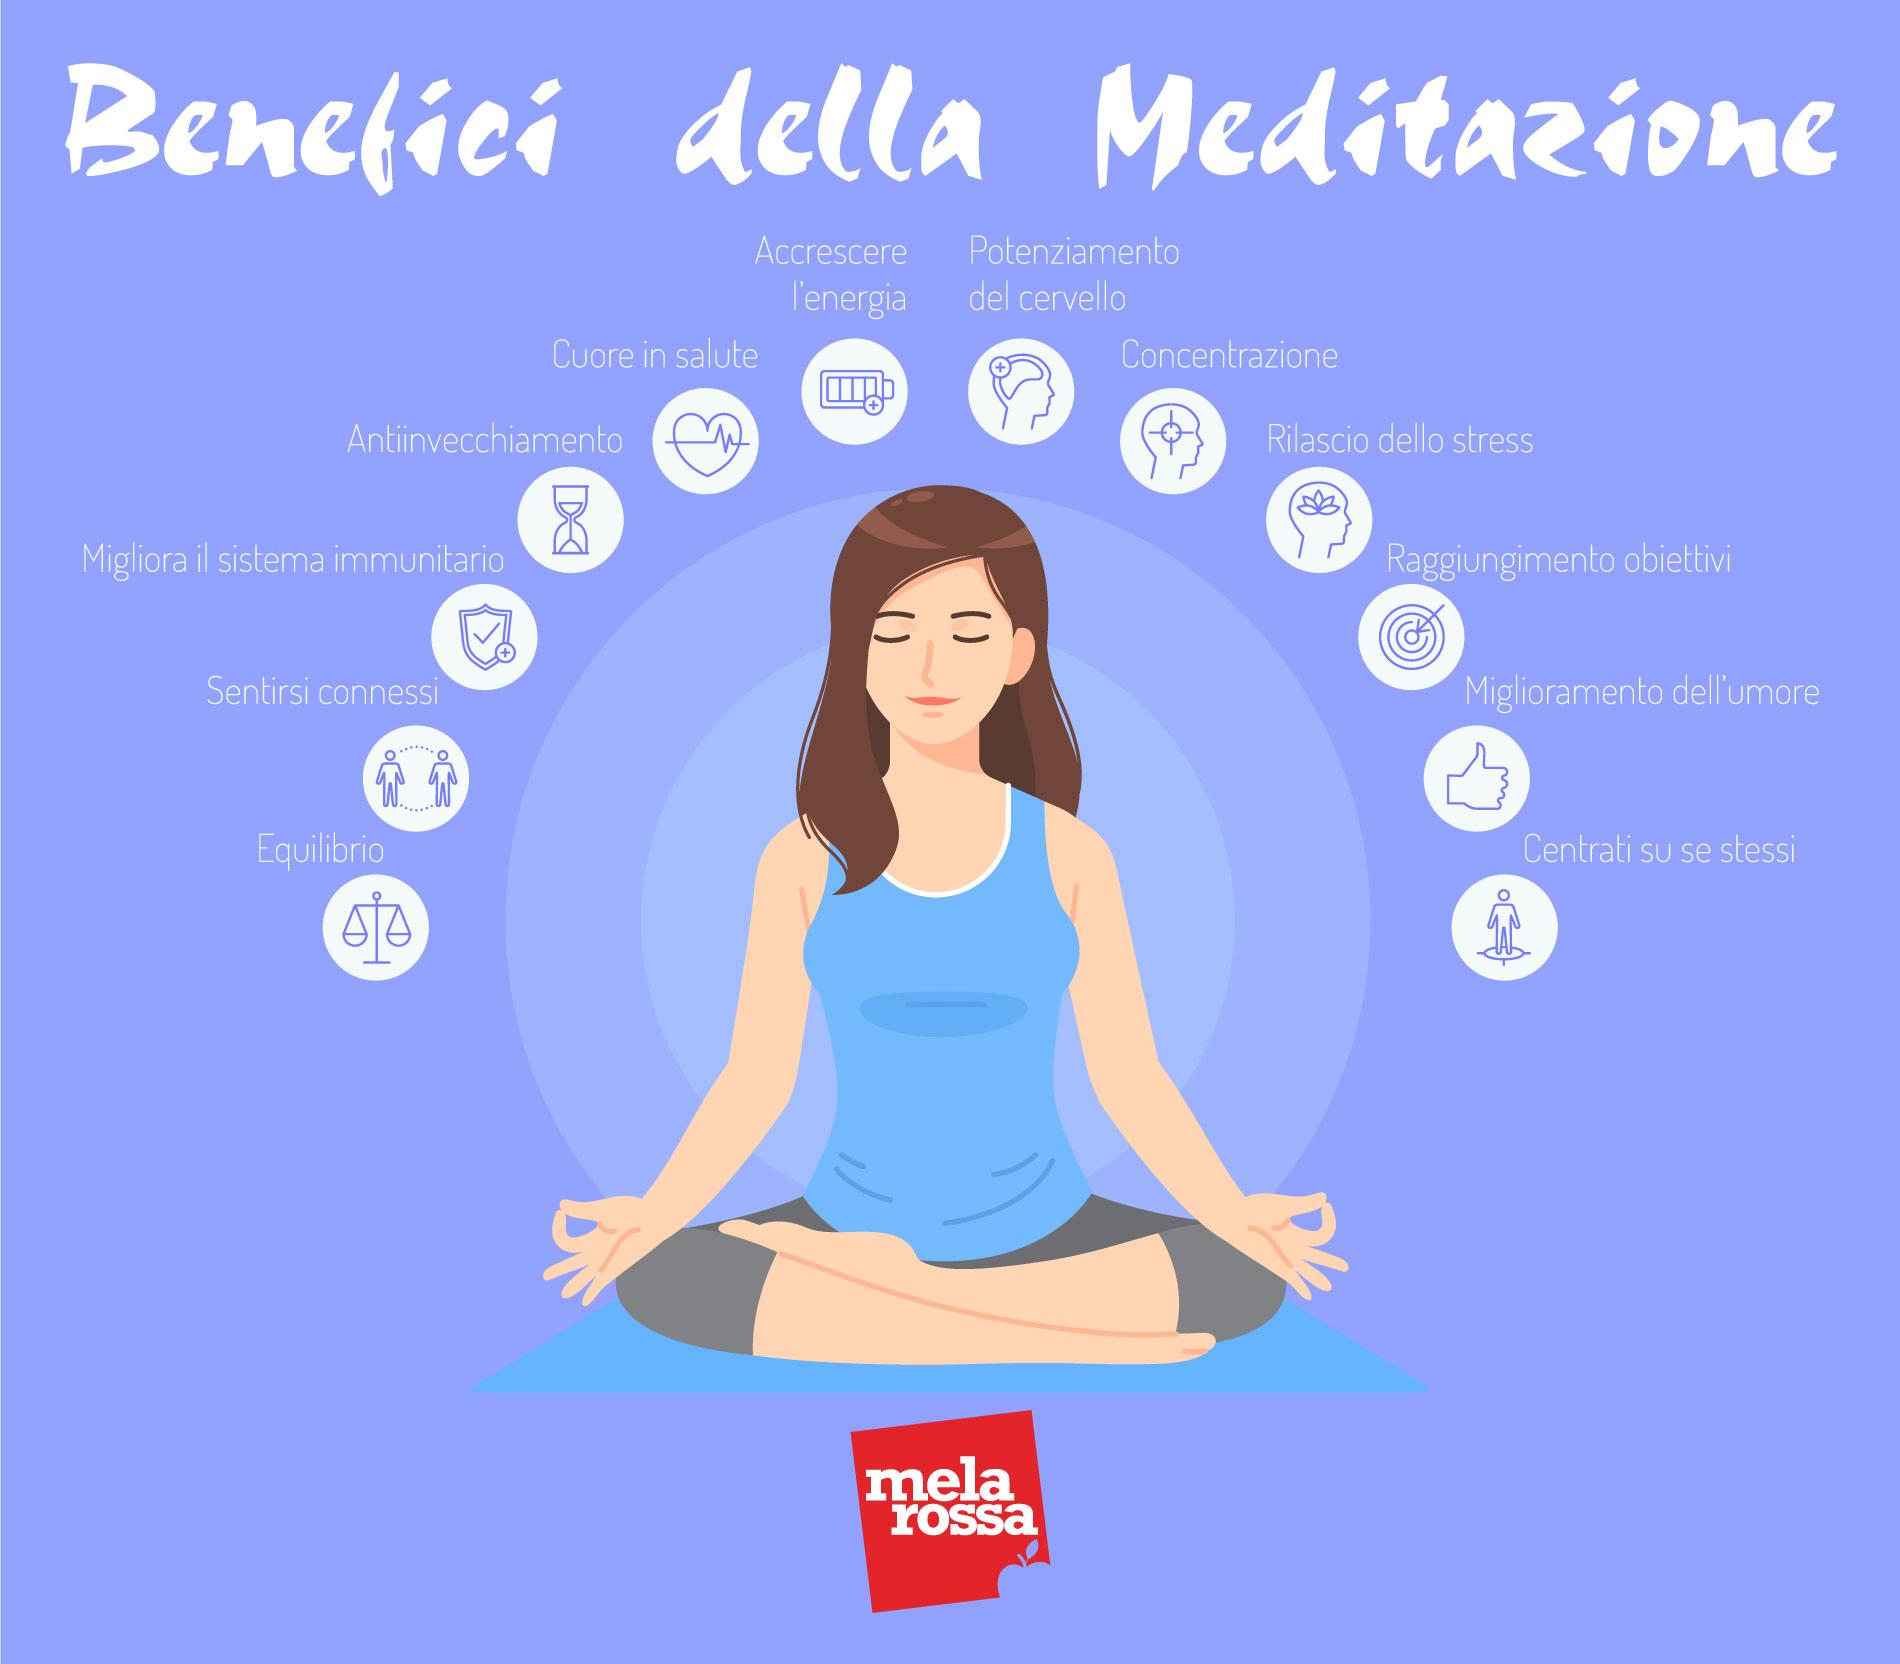 meditar: beneficios